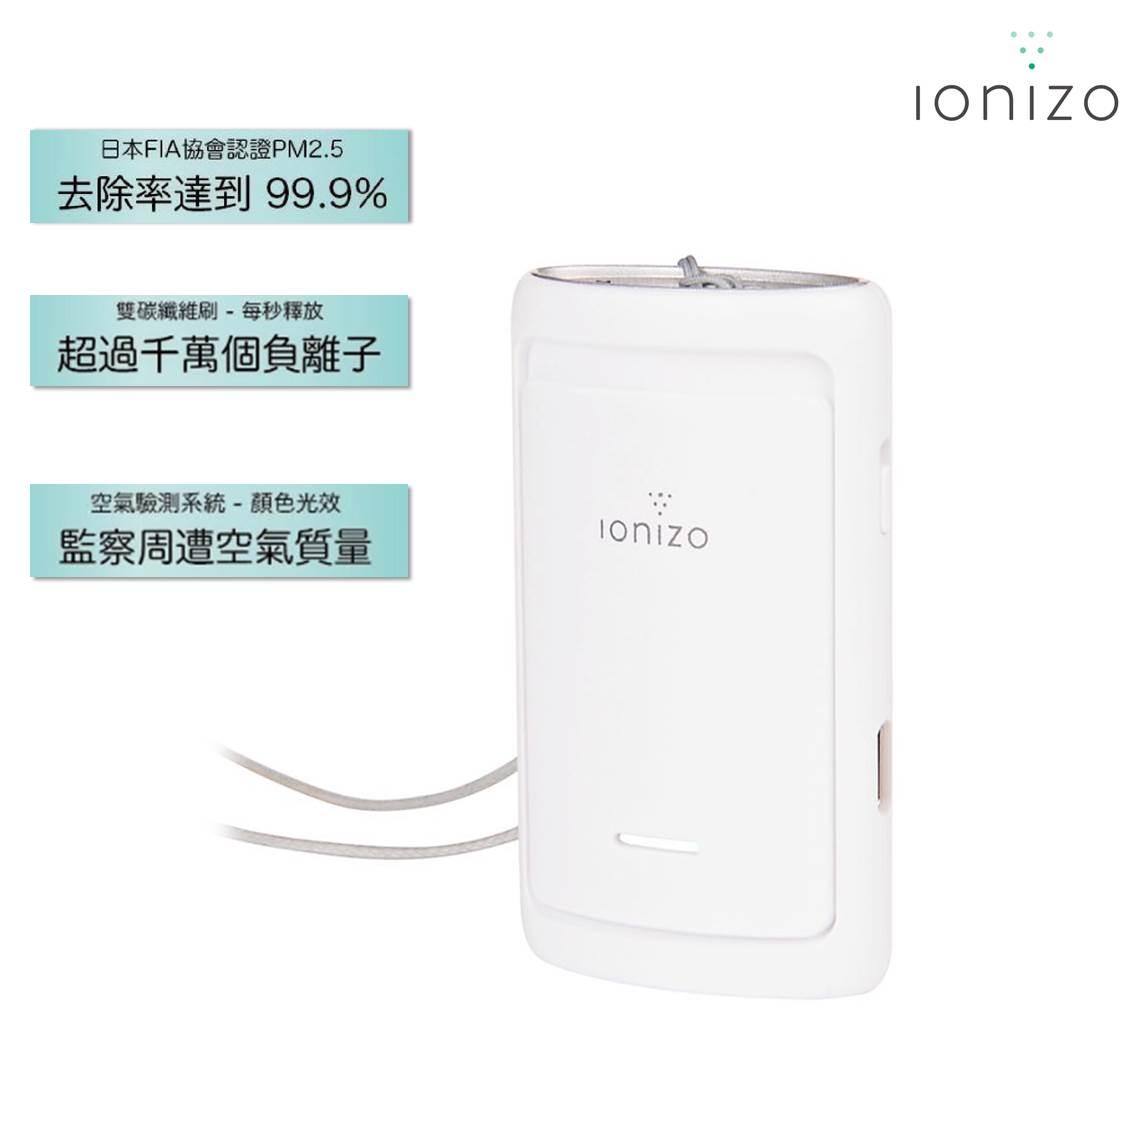 IONIZO2合1 隨身智能空氣淨化機+智能空氣驗測機 (銀)